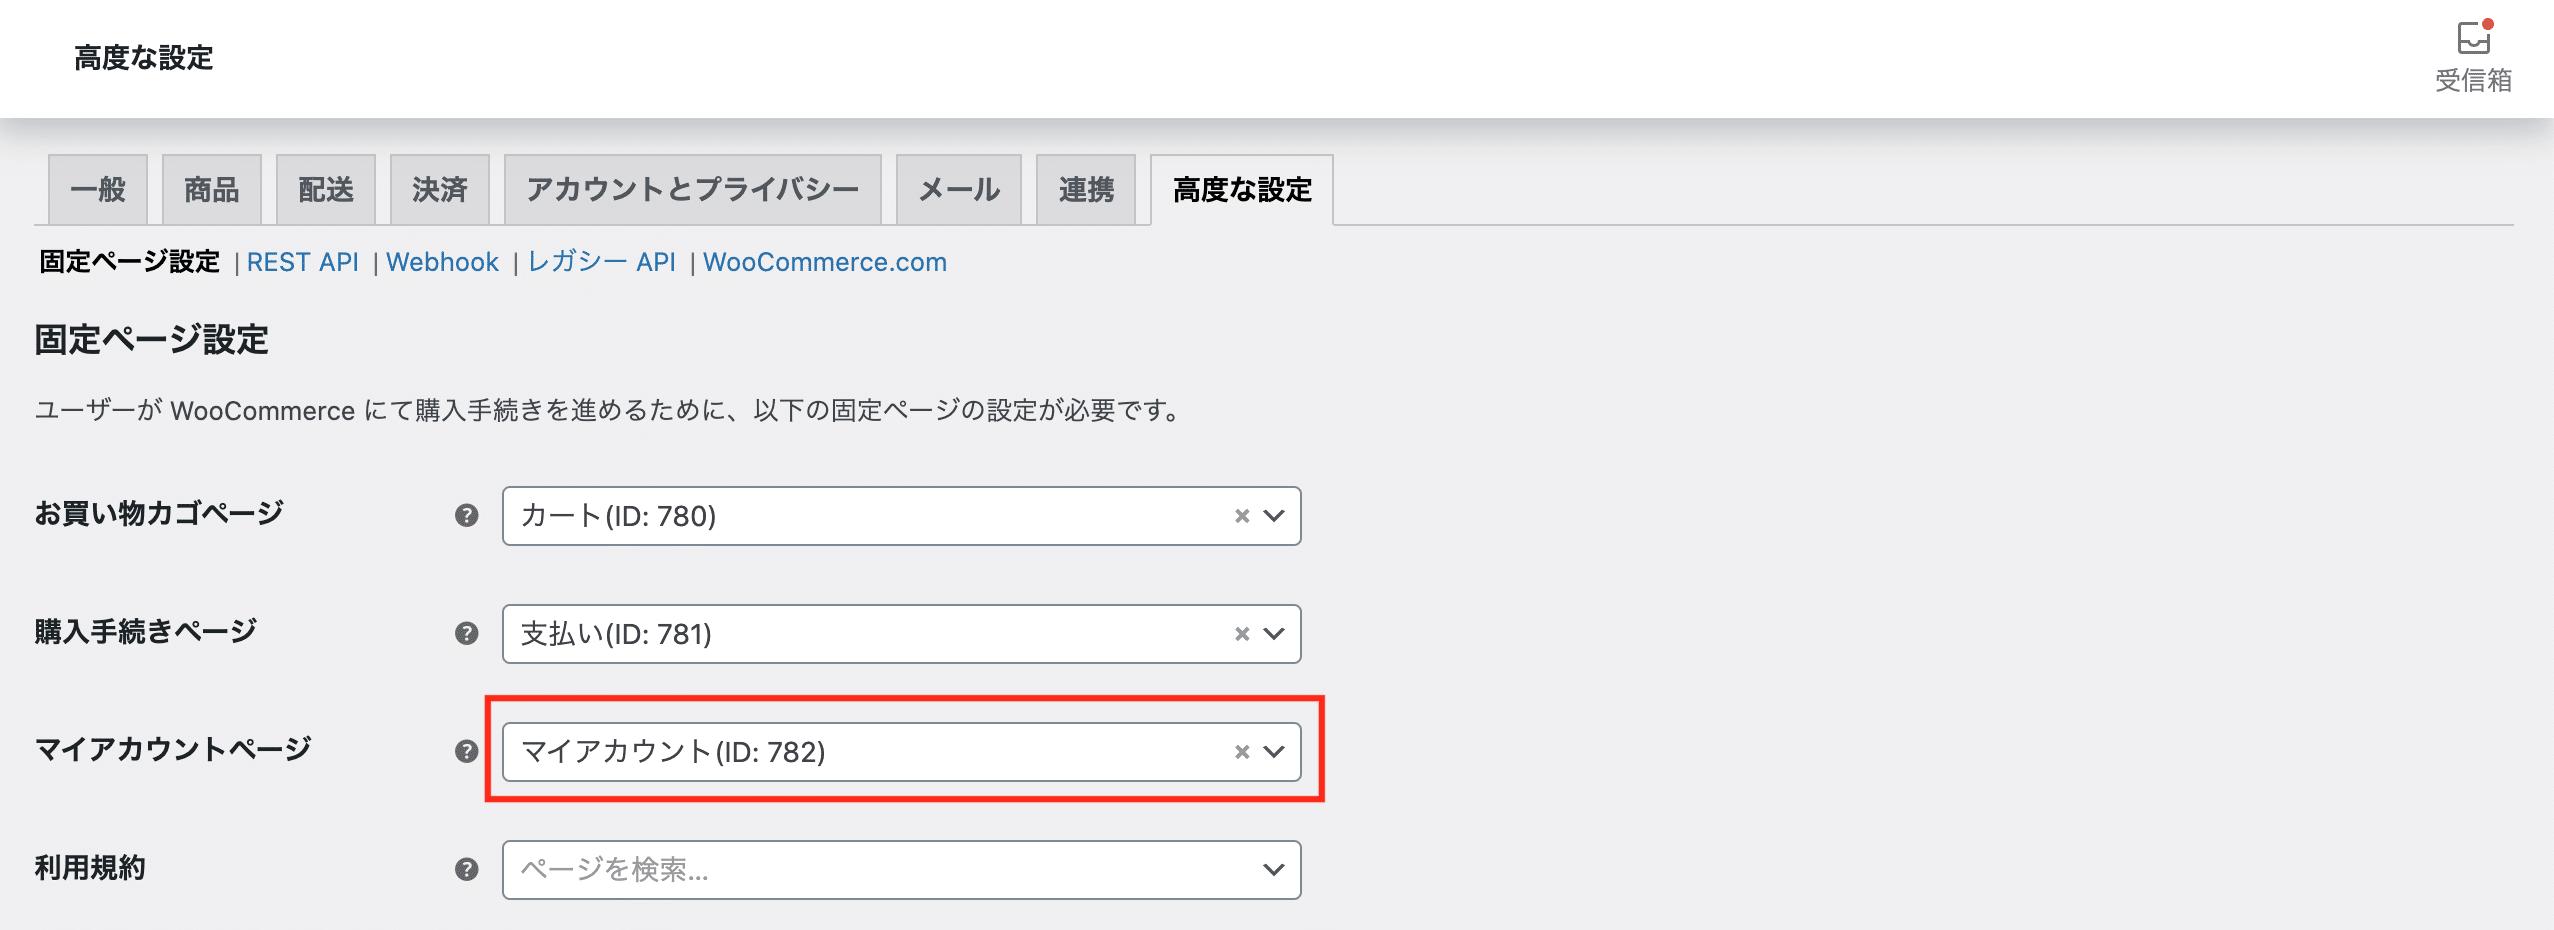 WooCommerceの高度な設定でマイアカウントページを設定する